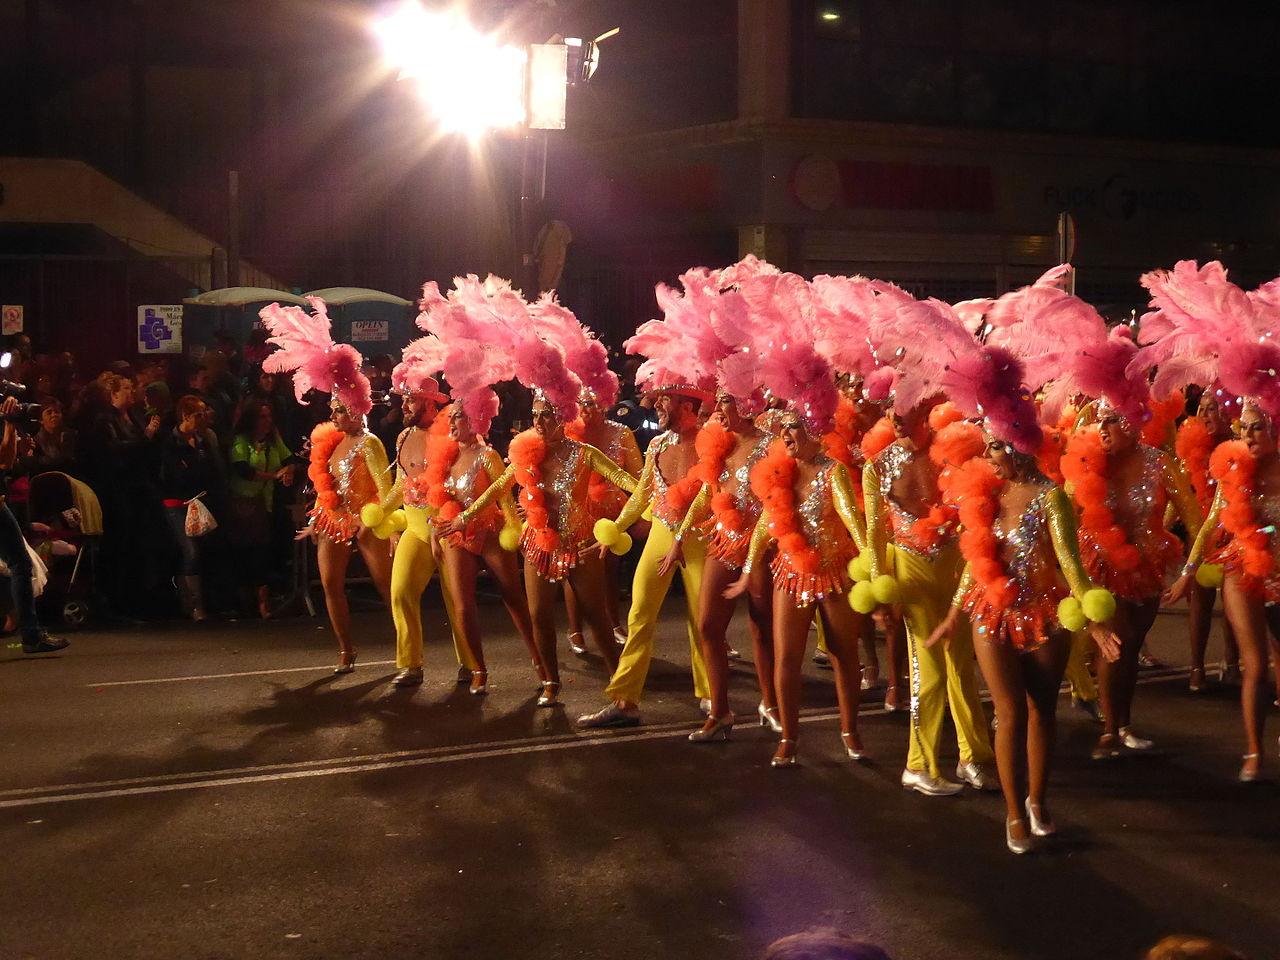 Carnaval de Santa Cruz de Tenerife - Wikipedia, la